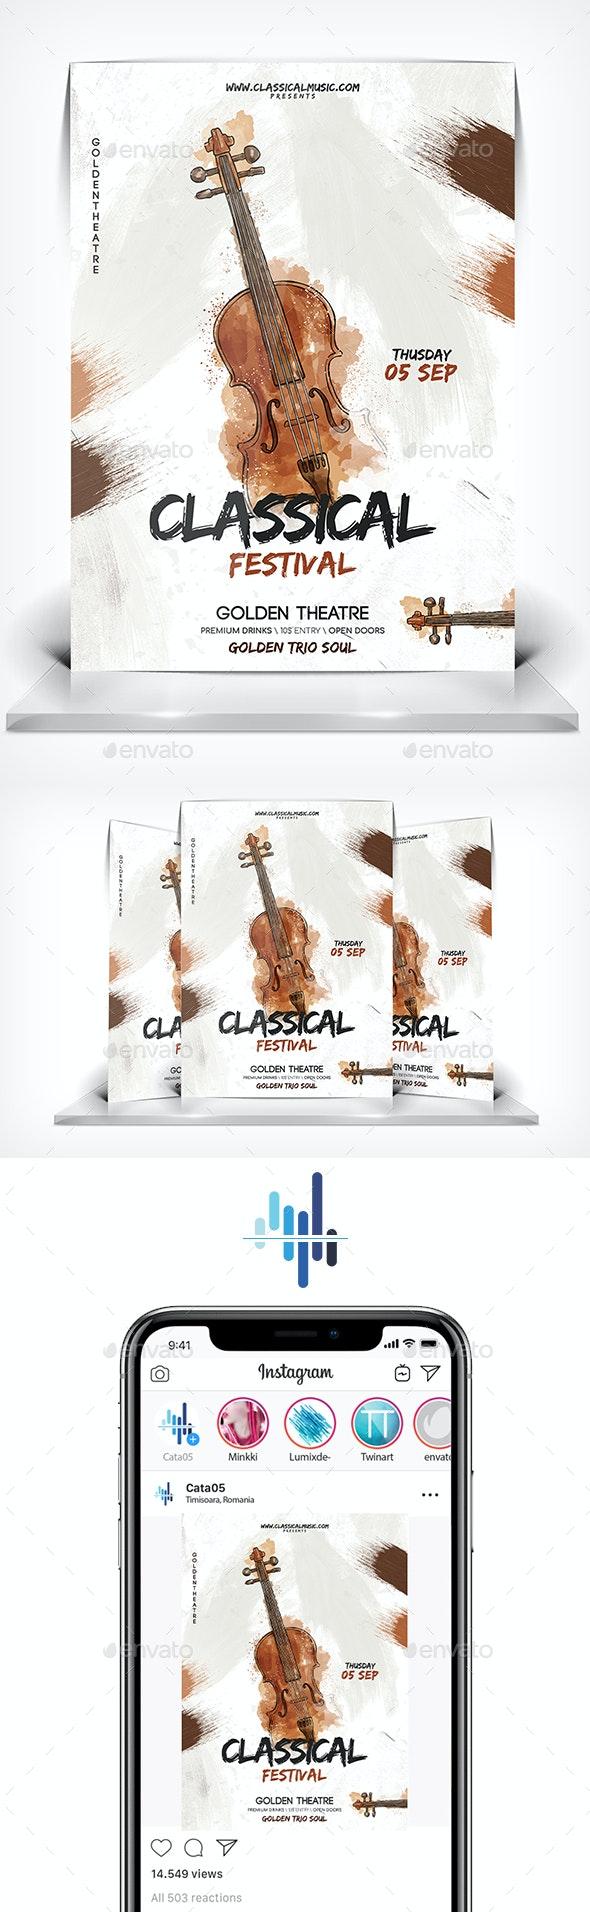 Classical Festival Flyer - Flyers Print Templates